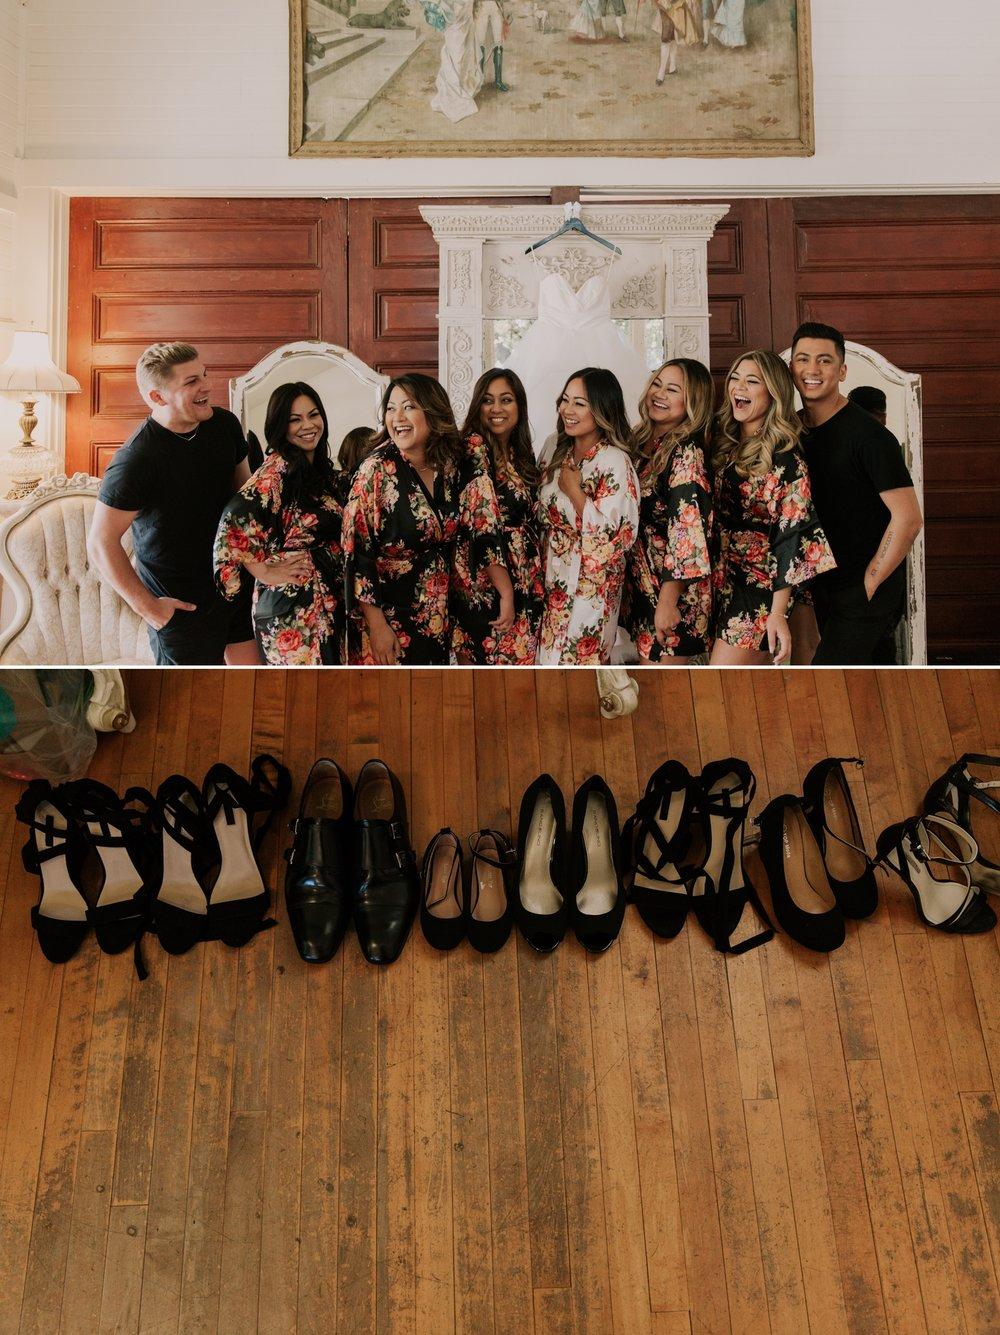 Bridal party photos during preparation at San Diego wedding venue